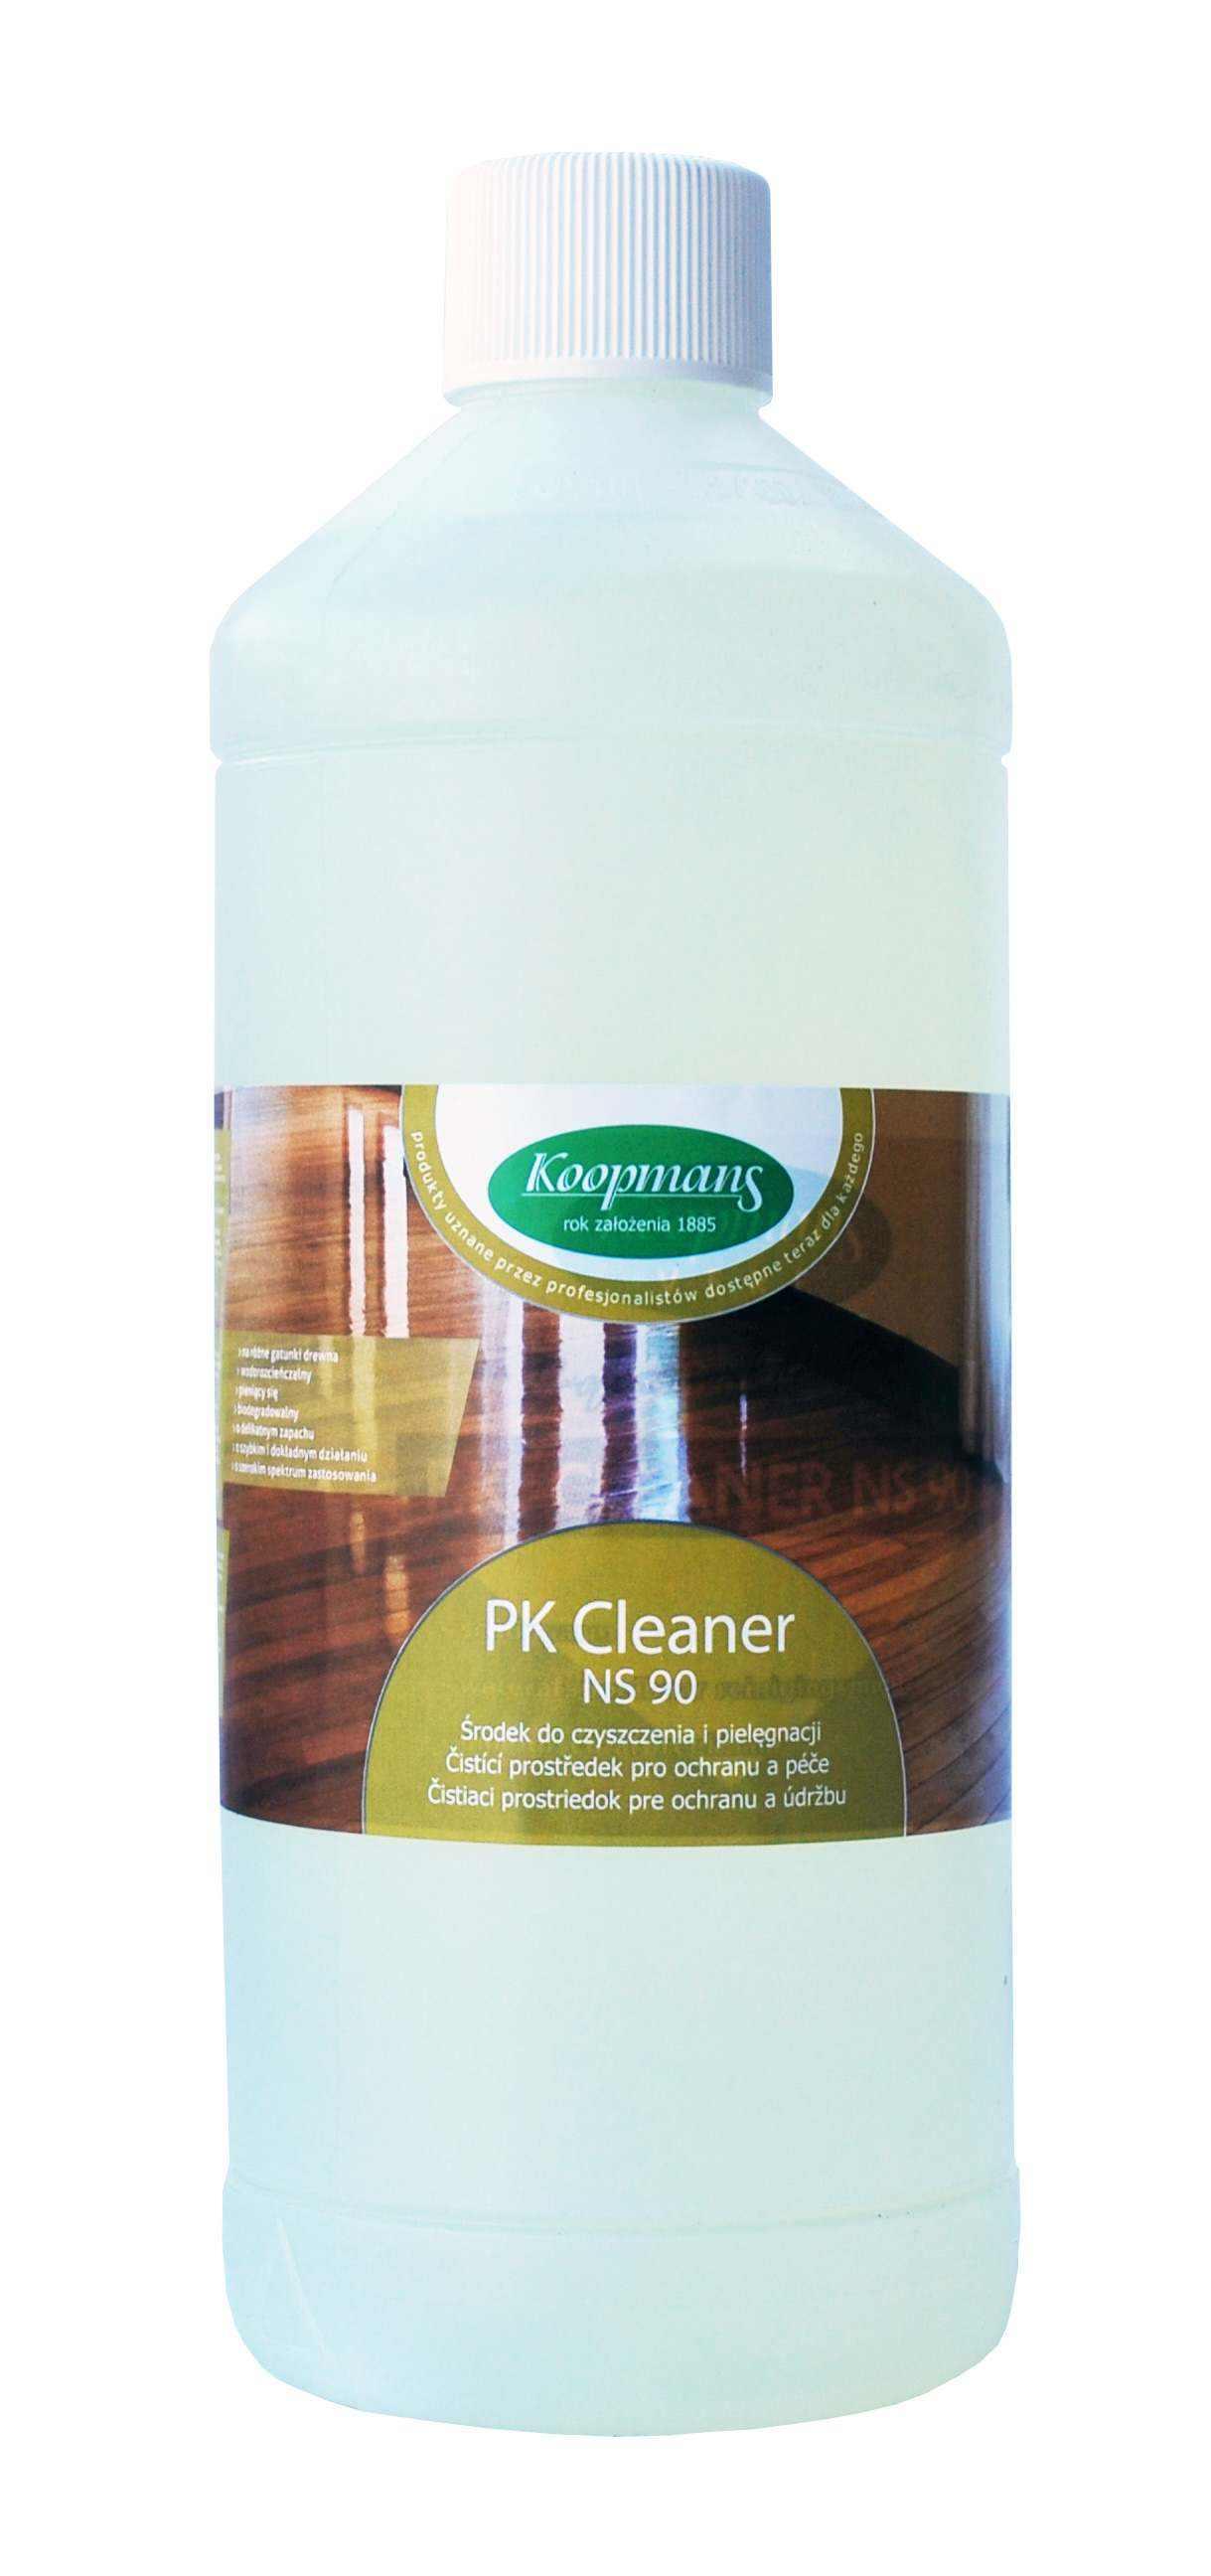 Koopmans PK Cleaner NS 90 - čistící prostředek